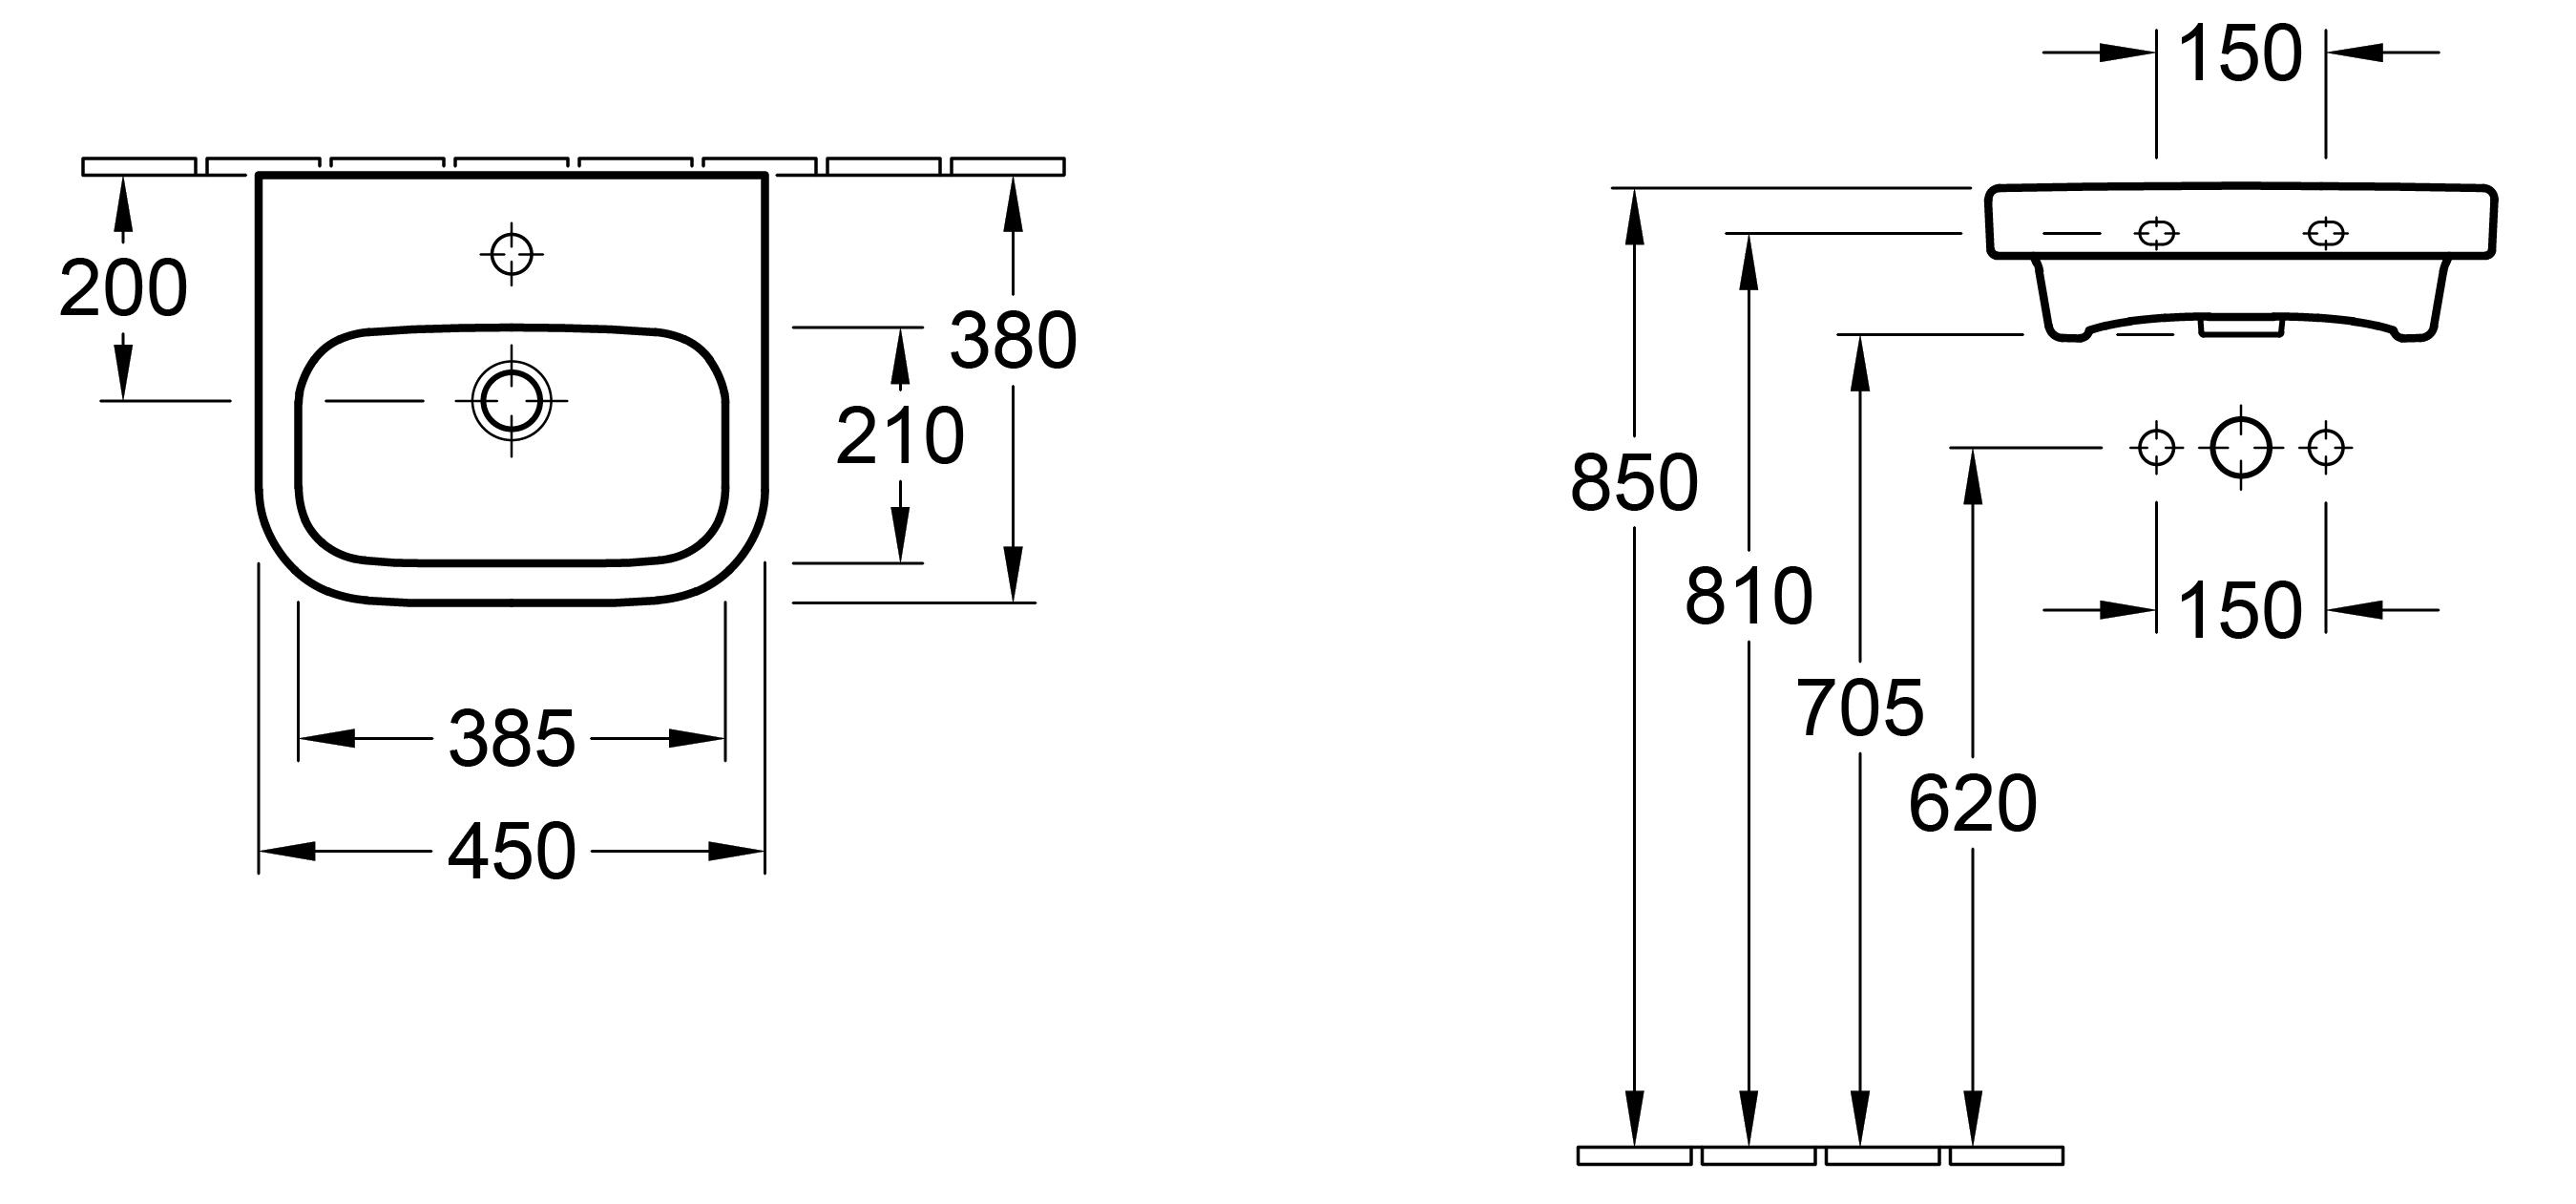 Architectura 450 Handwash Basin